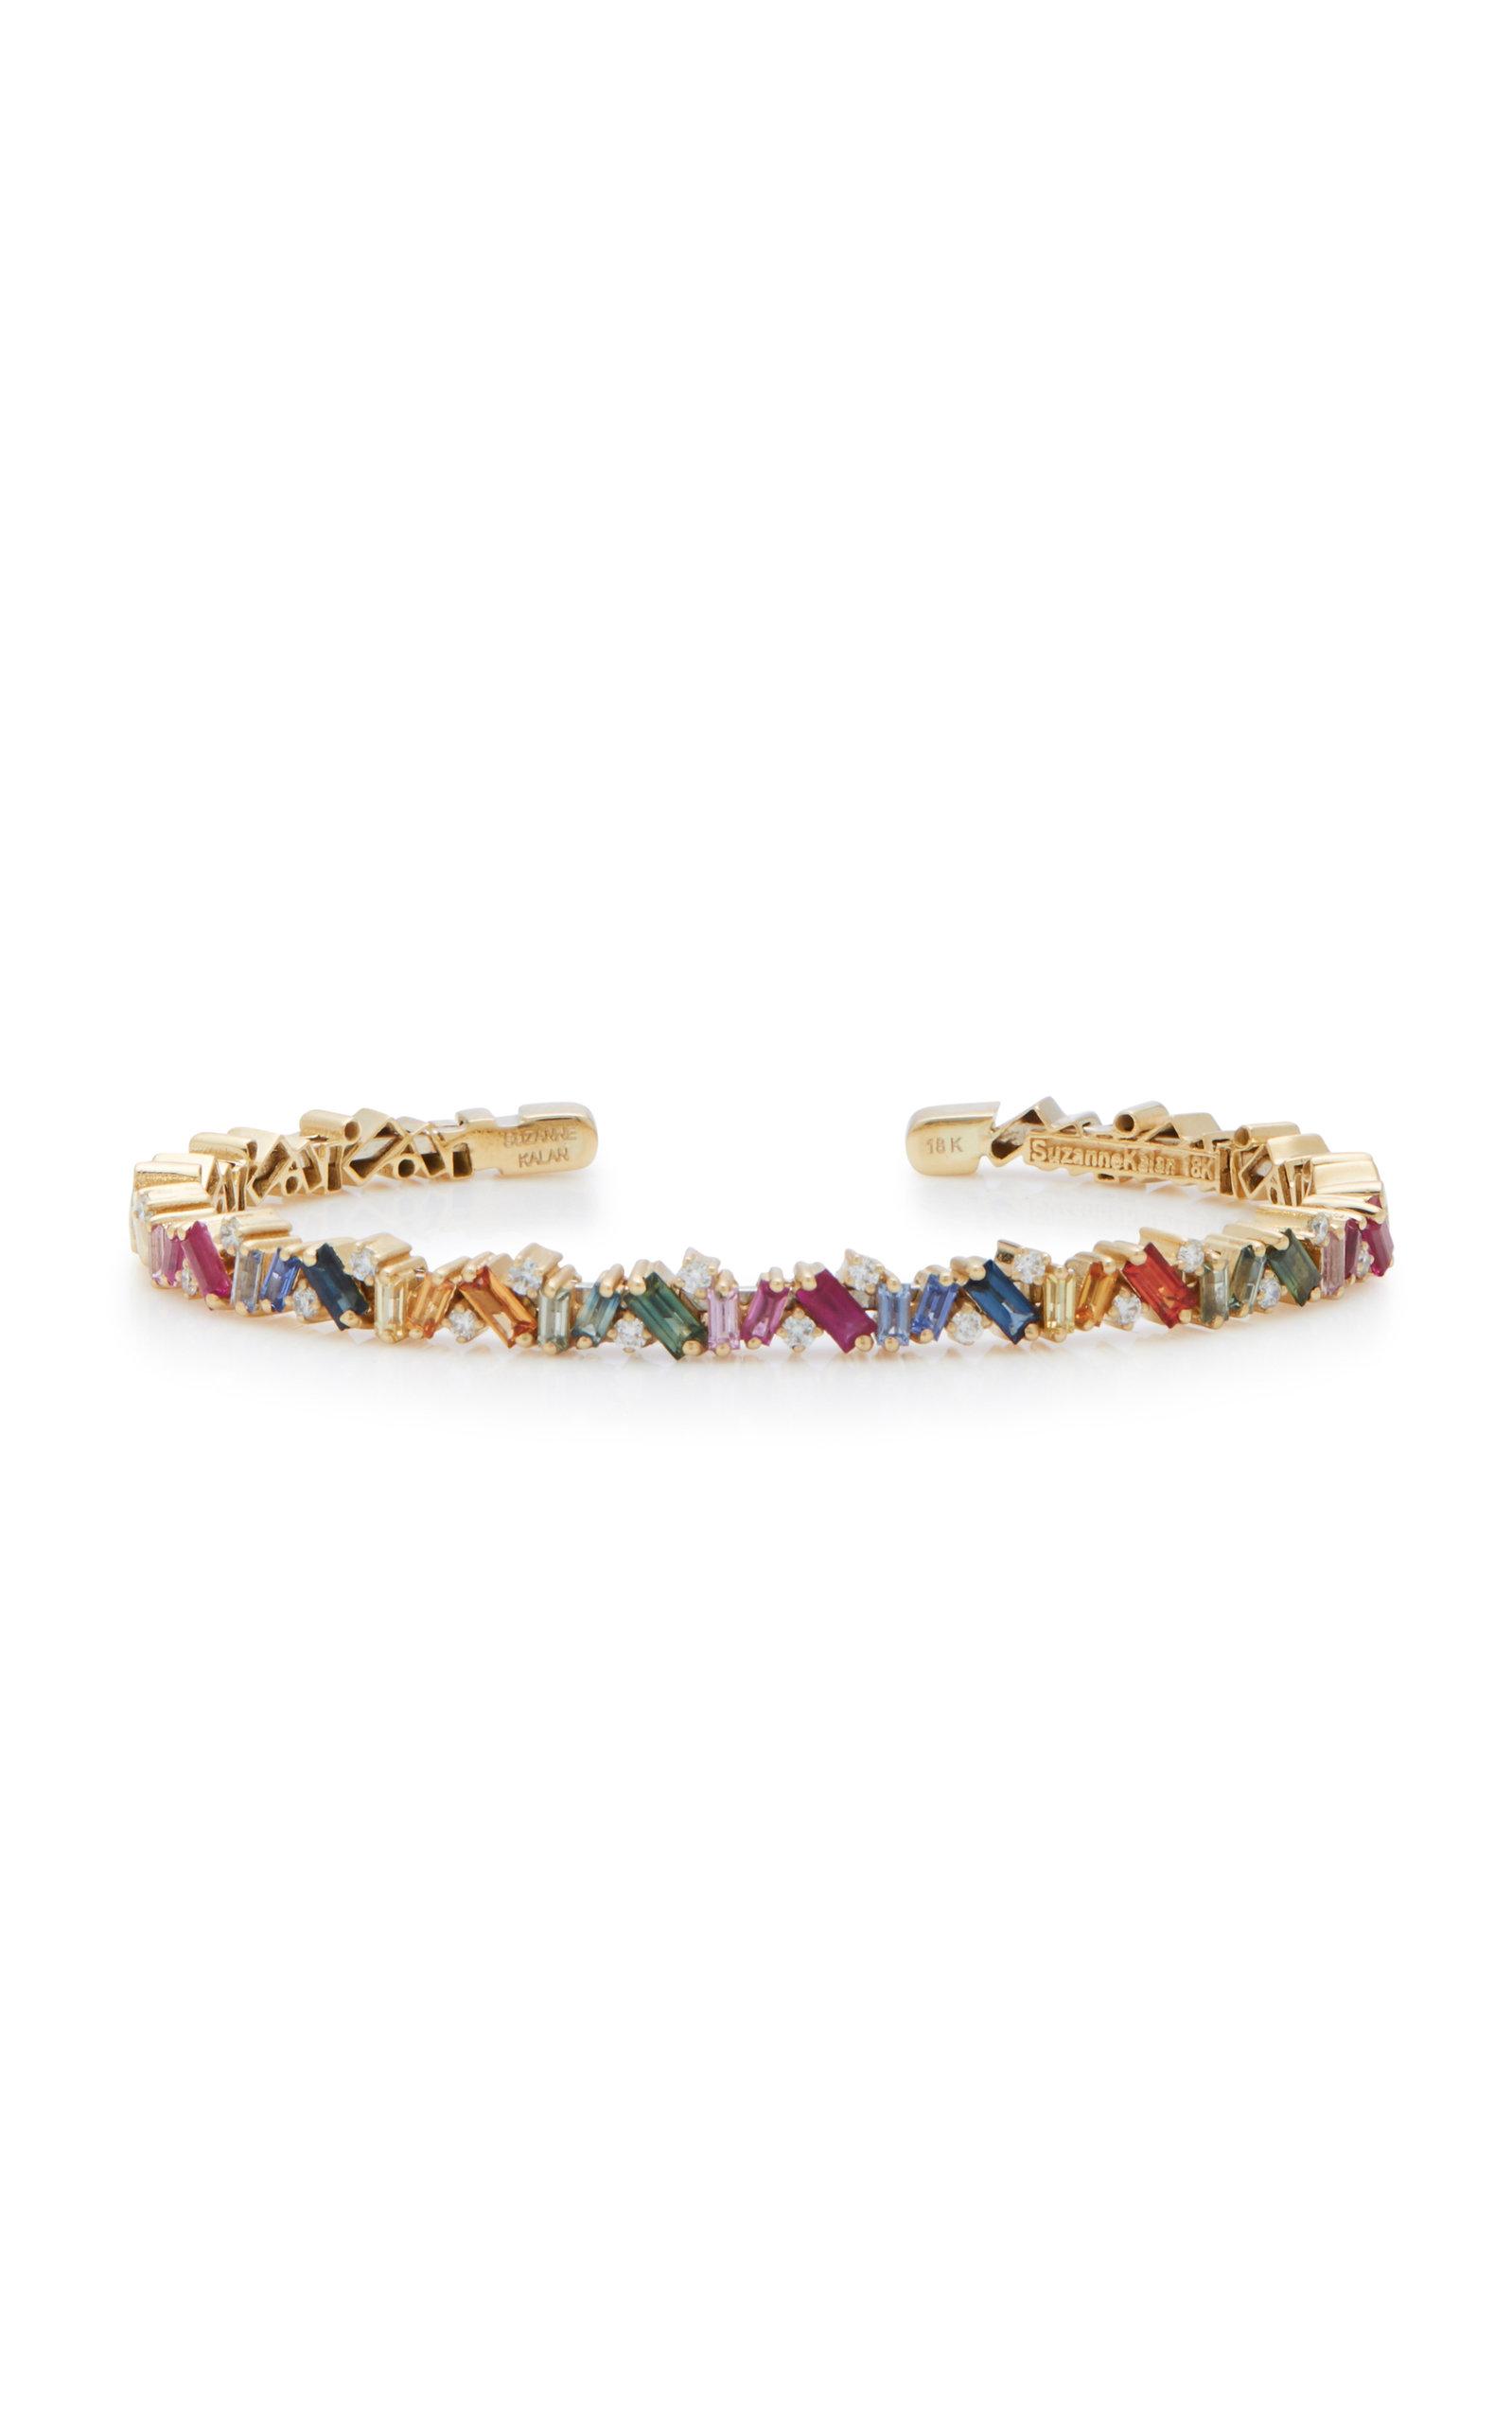 Suzanne Kalan 18K GOLD RAINBOW SAPPHIRE AND DIAMOND BRACELET